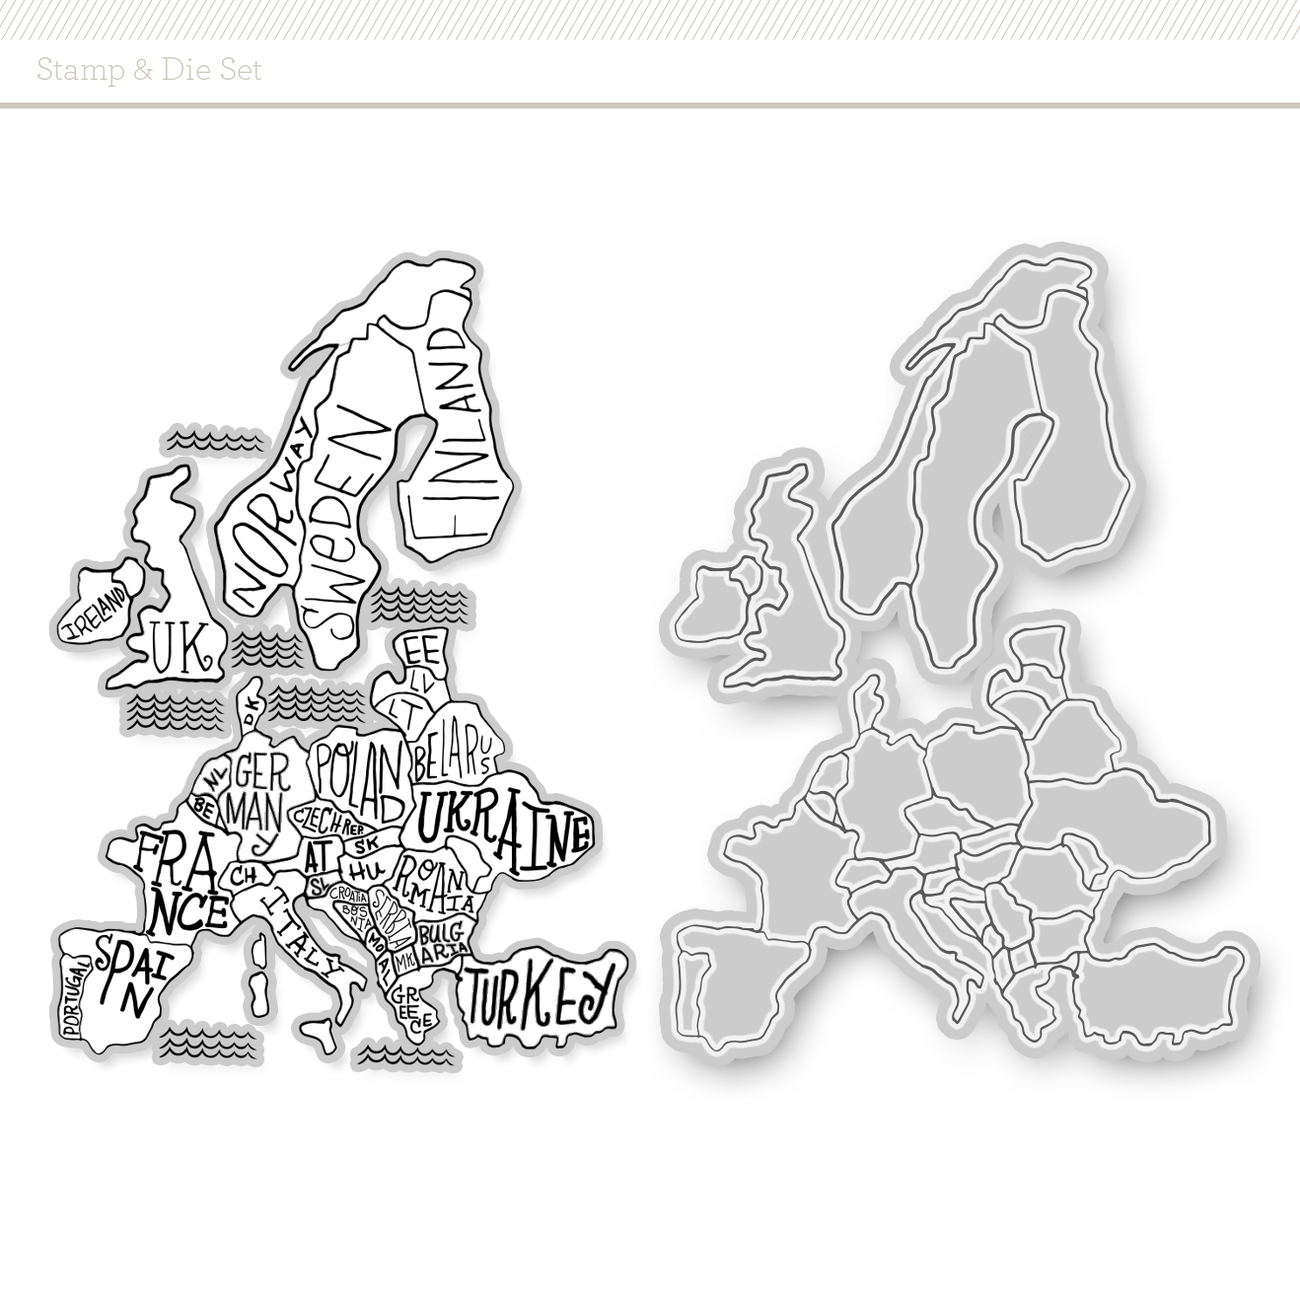 Picture 1 of Europe Stamp + Die Set